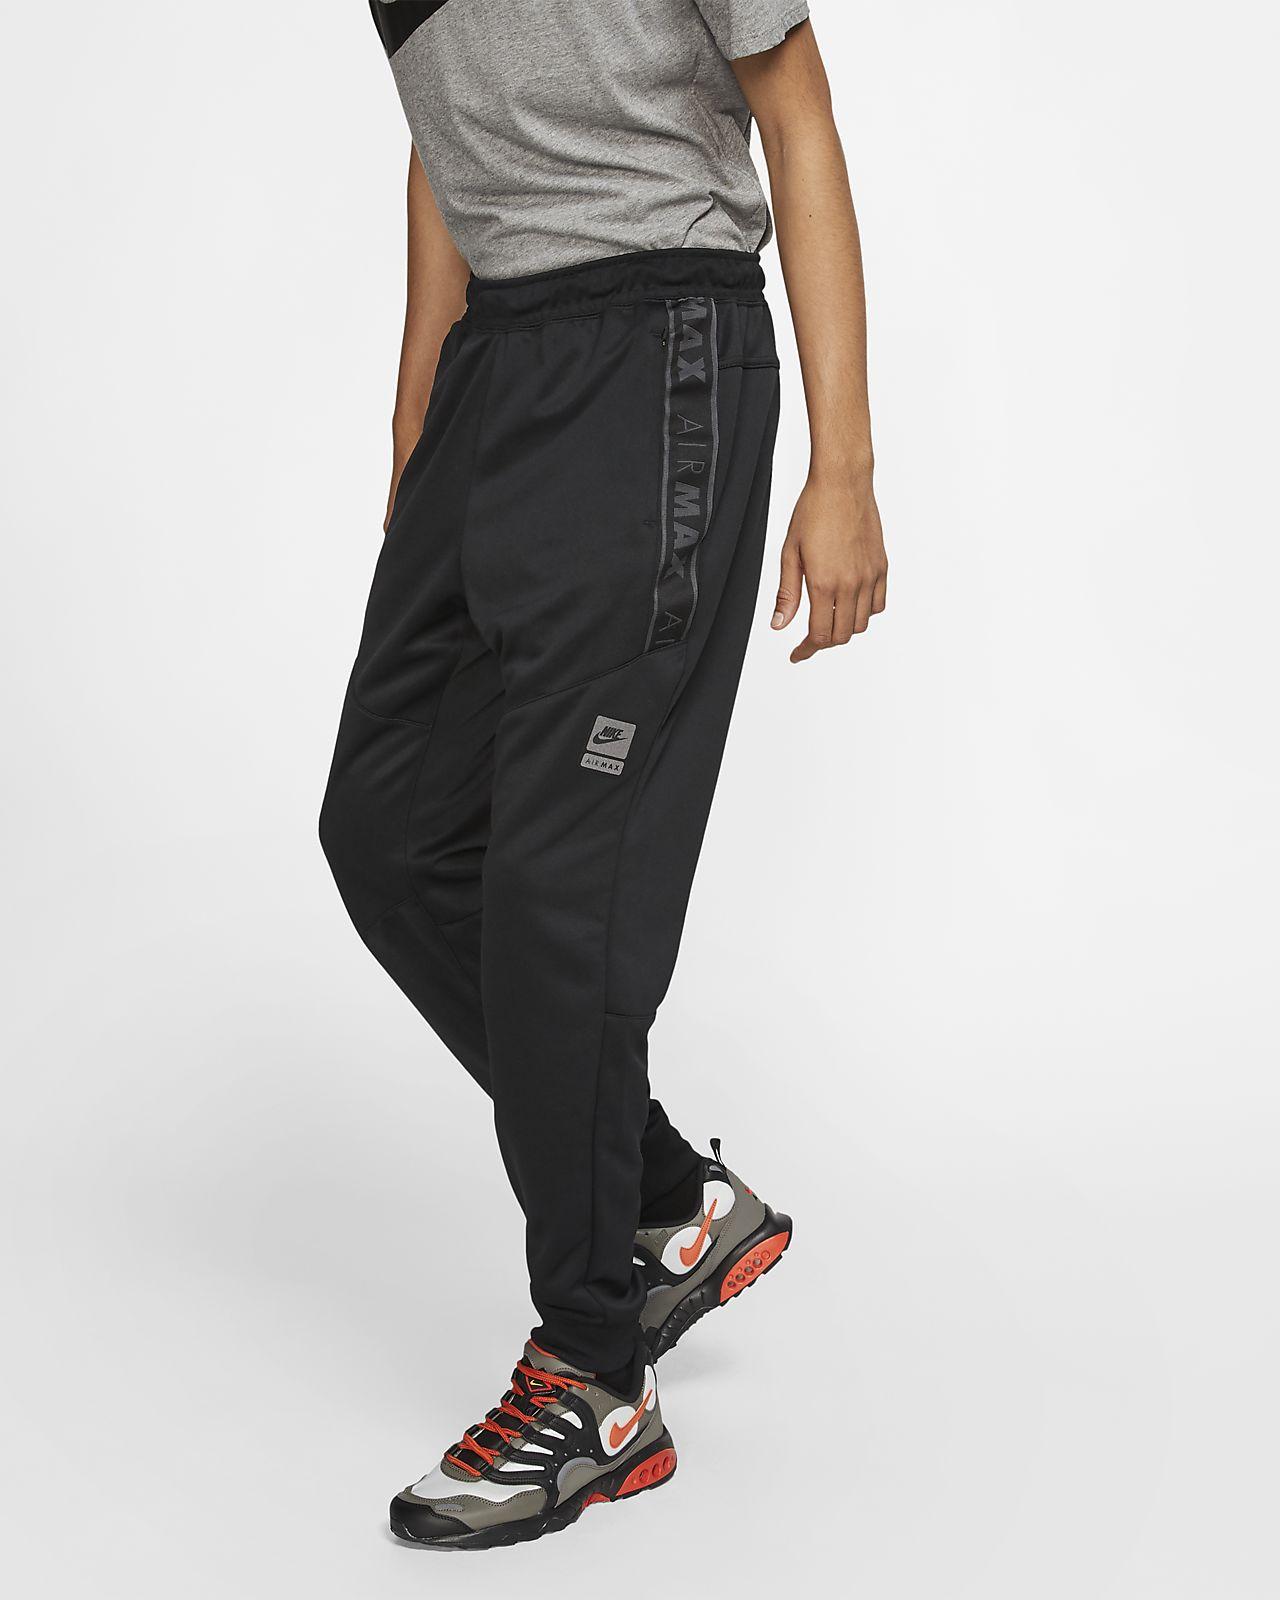 Pánské běžecké kalhoty Nike Sportswear Air Max